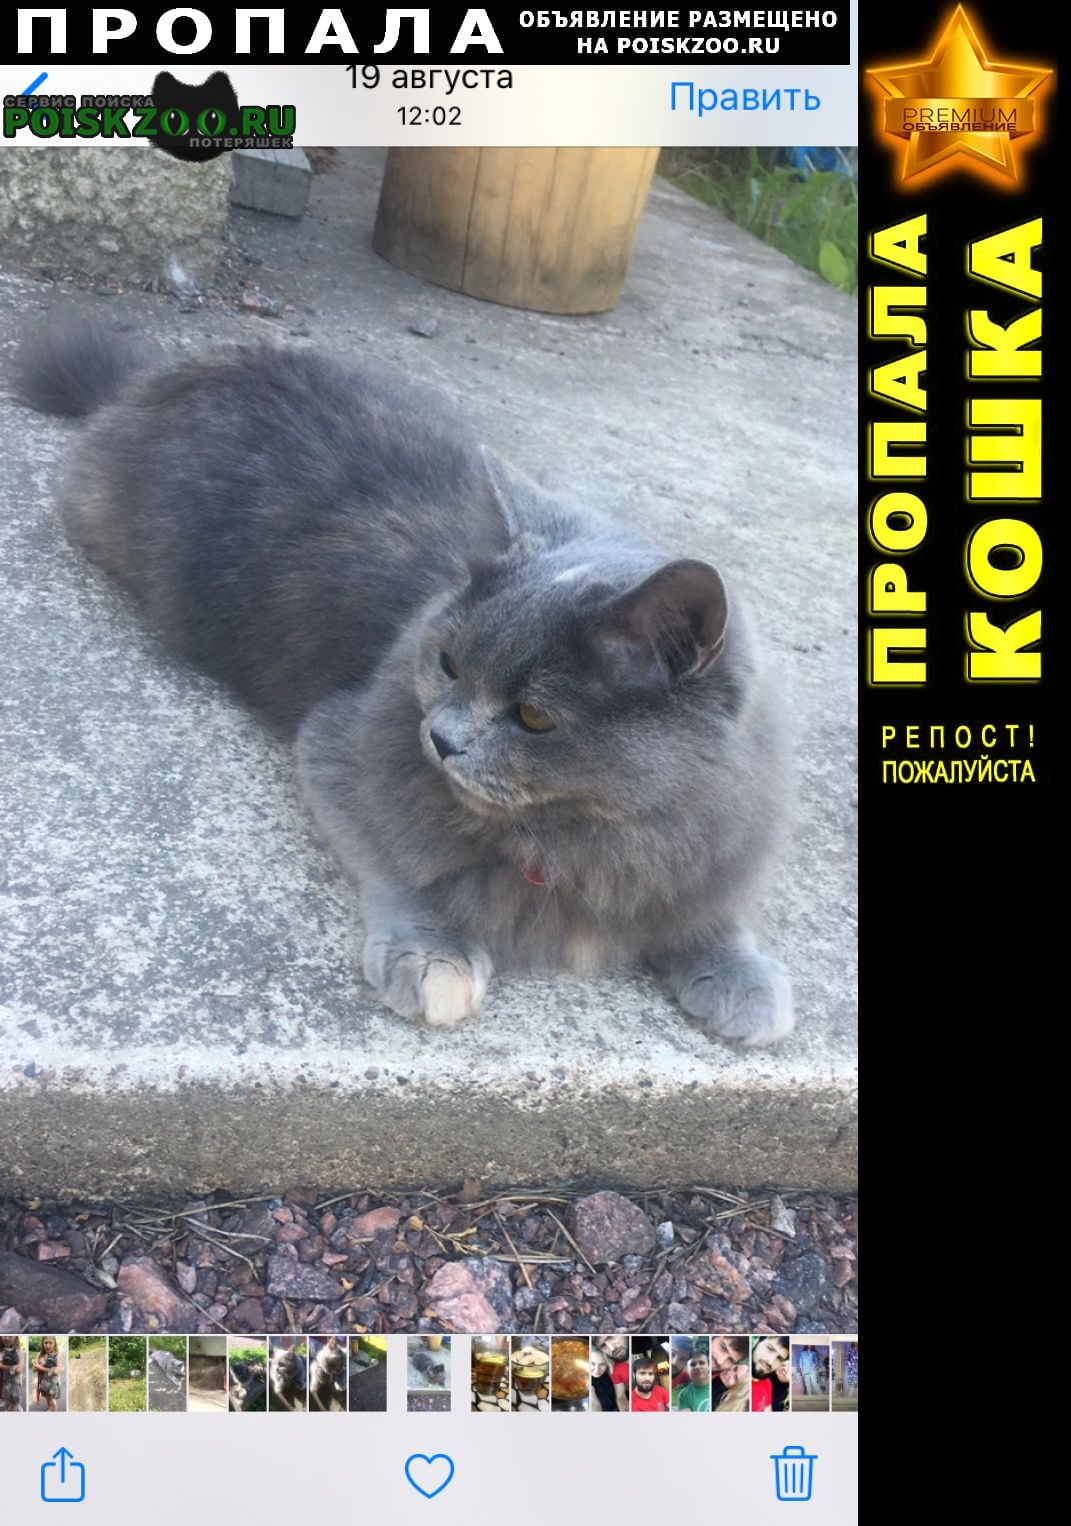 Пропала кошка Зеленогорск (Ленинградская обл.)